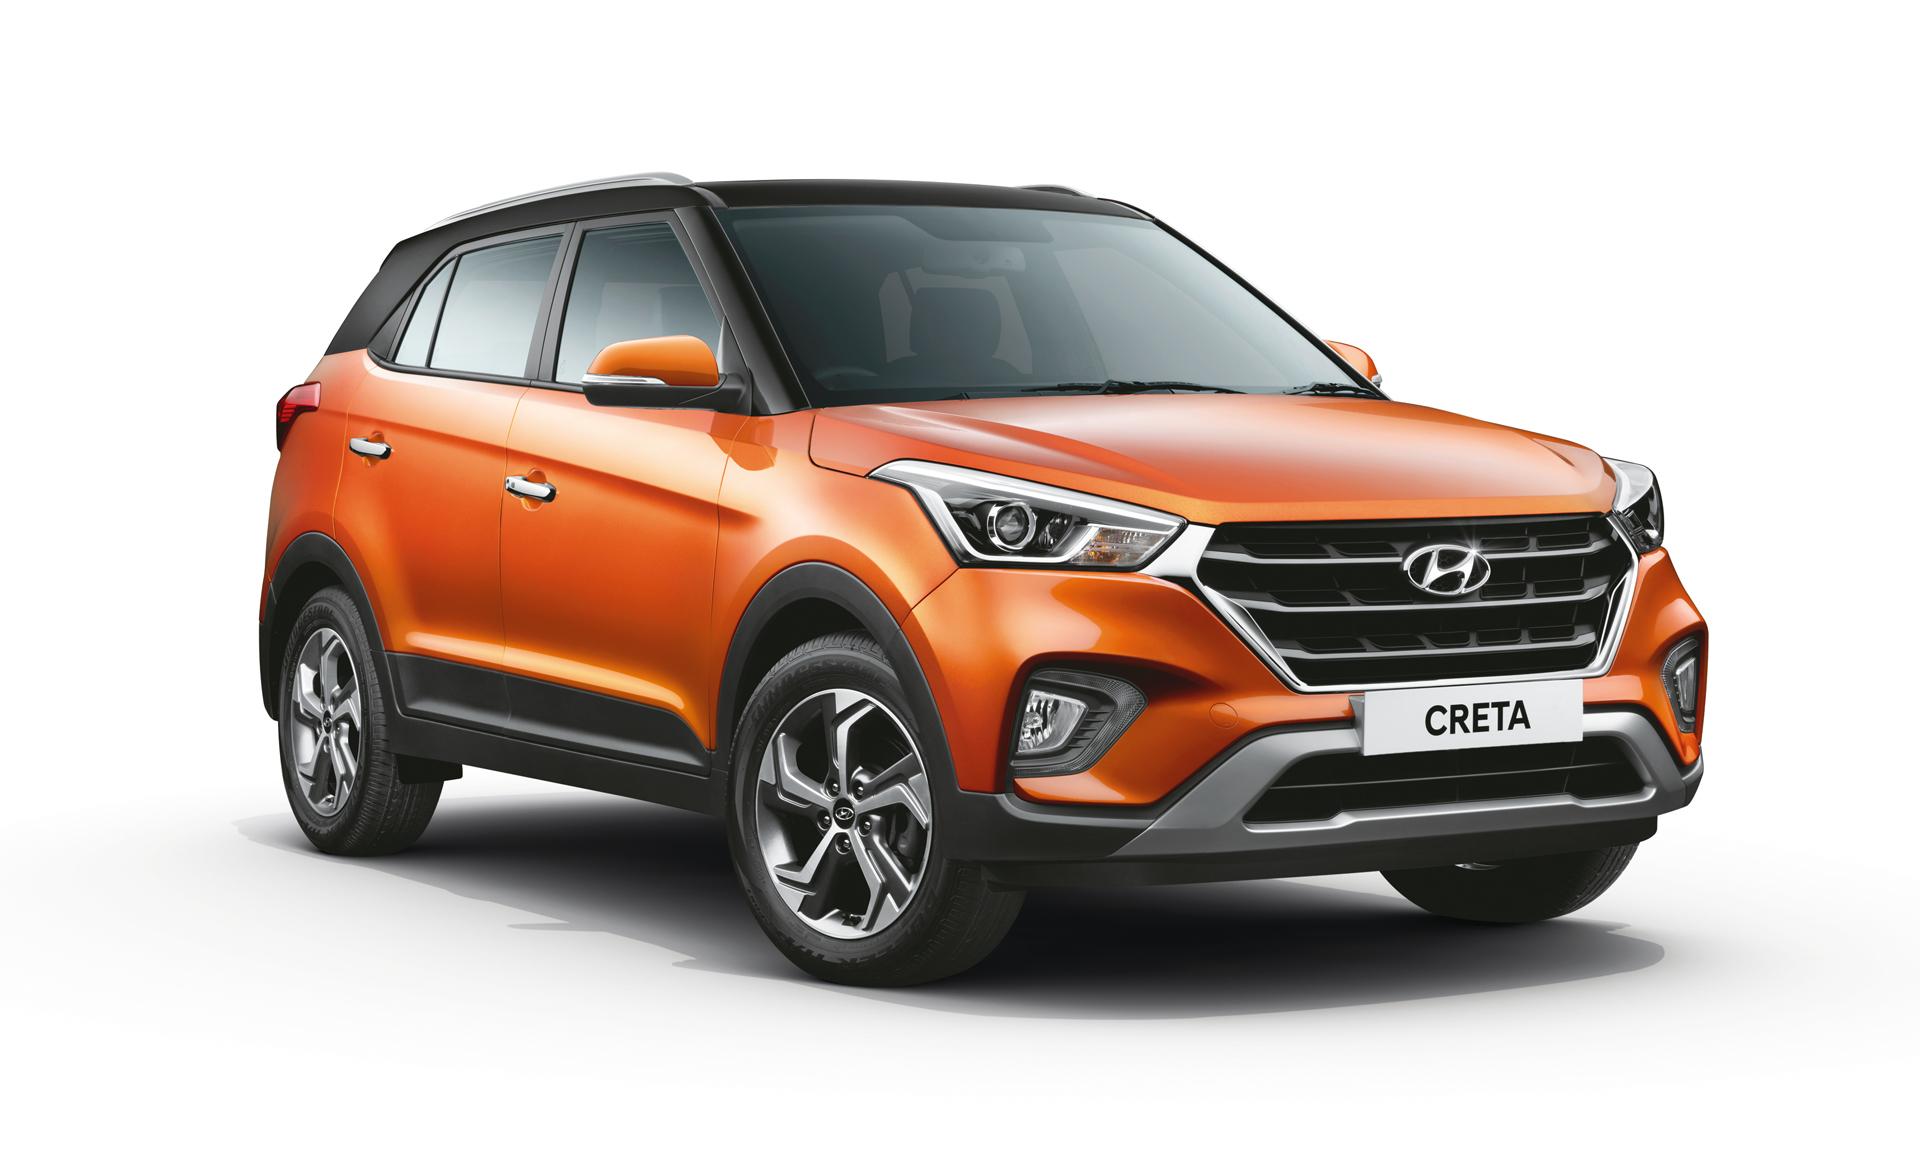 Hyundai Creta 2018 S 1.4 CRDI Image